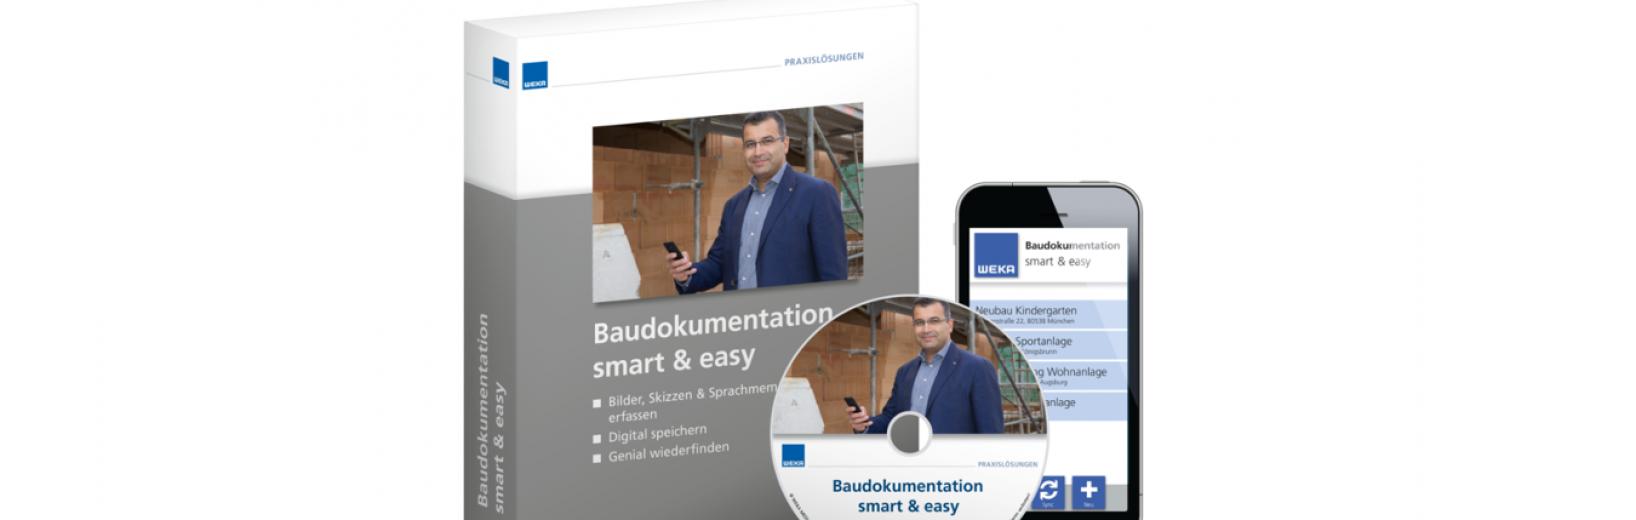 Baudokumentation smart&easy